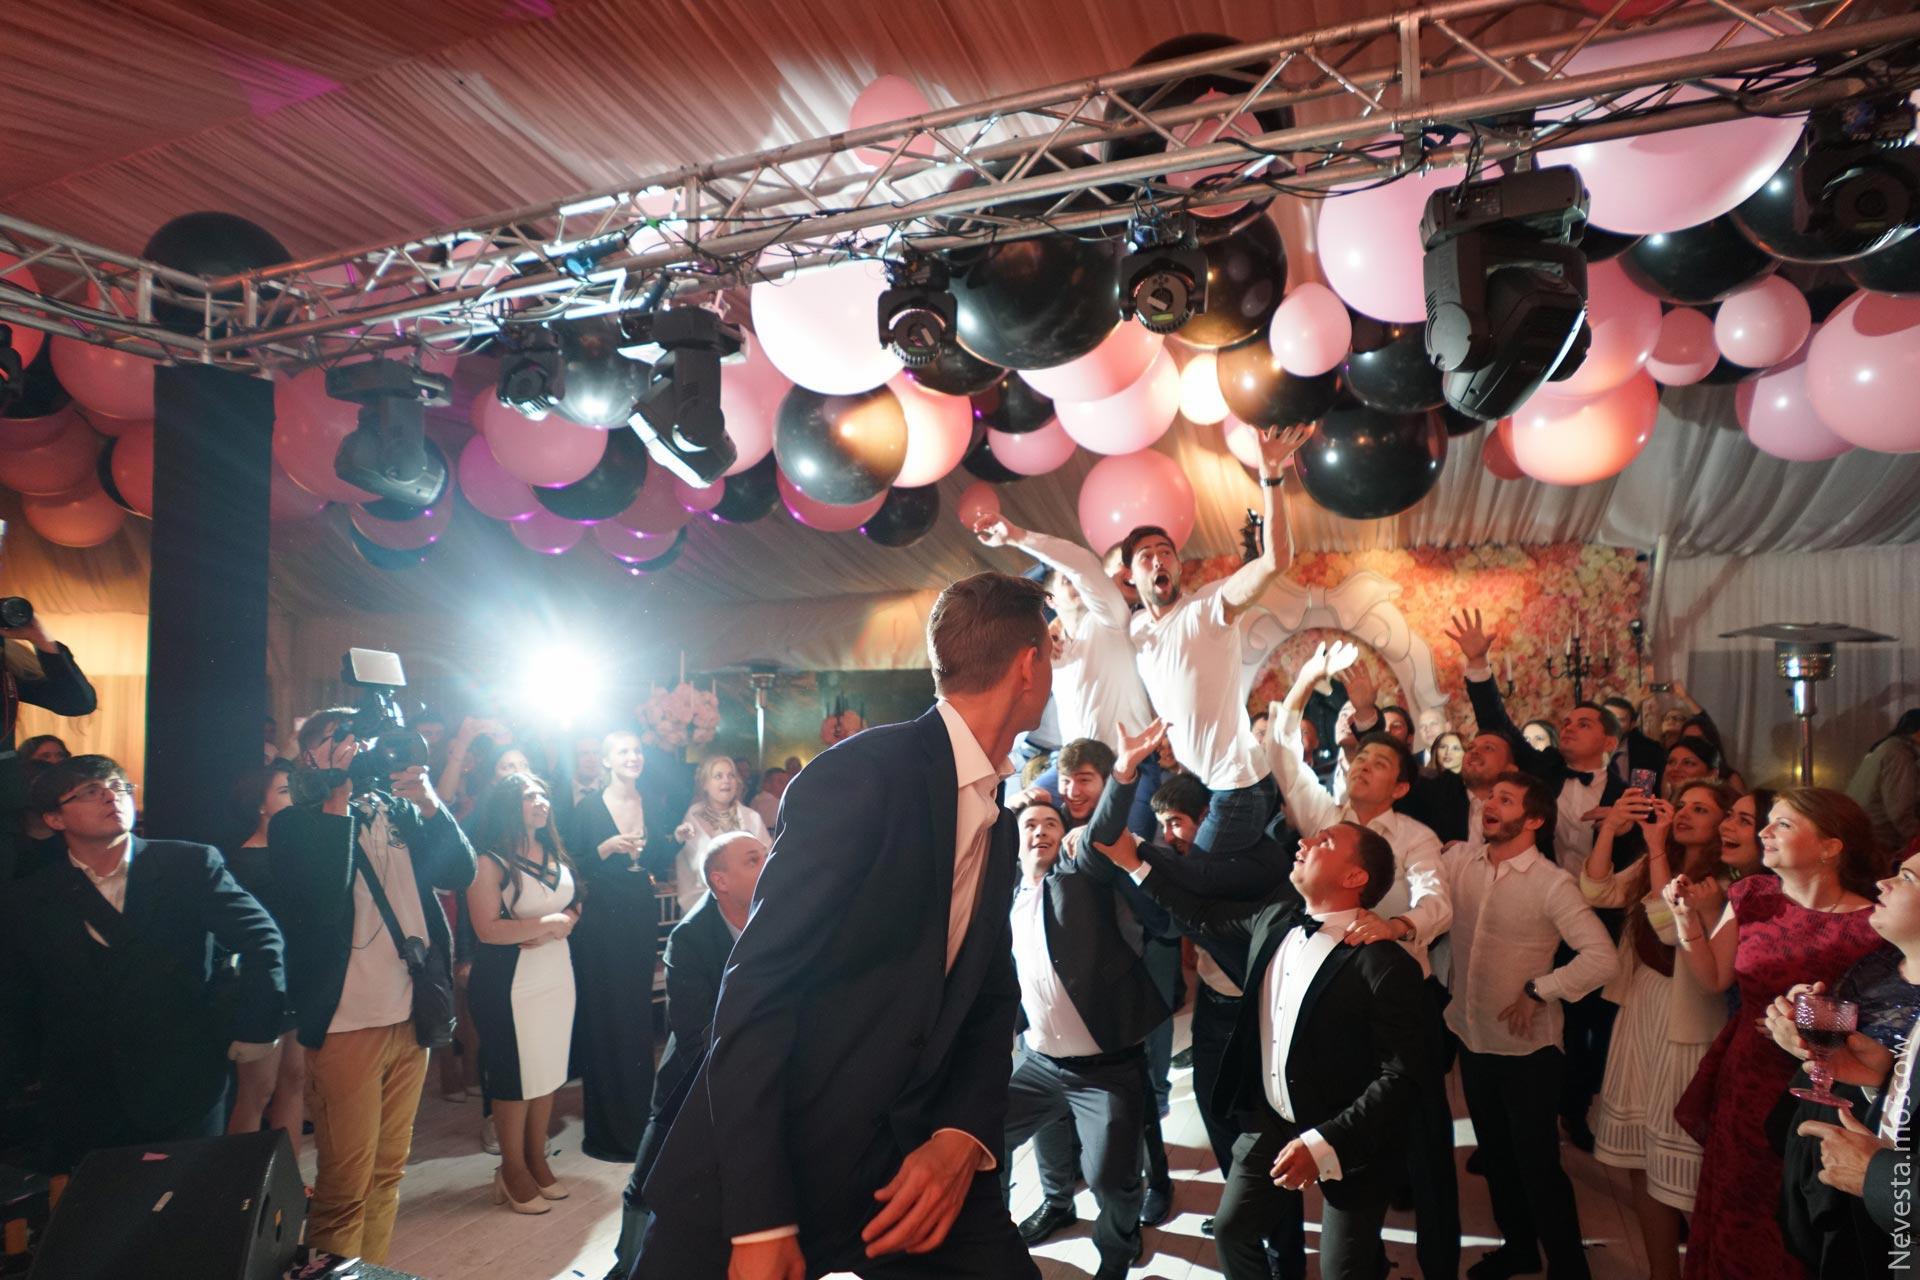 Свадьба Нелли Ермолаевой и Кирилла Андреева фото 56